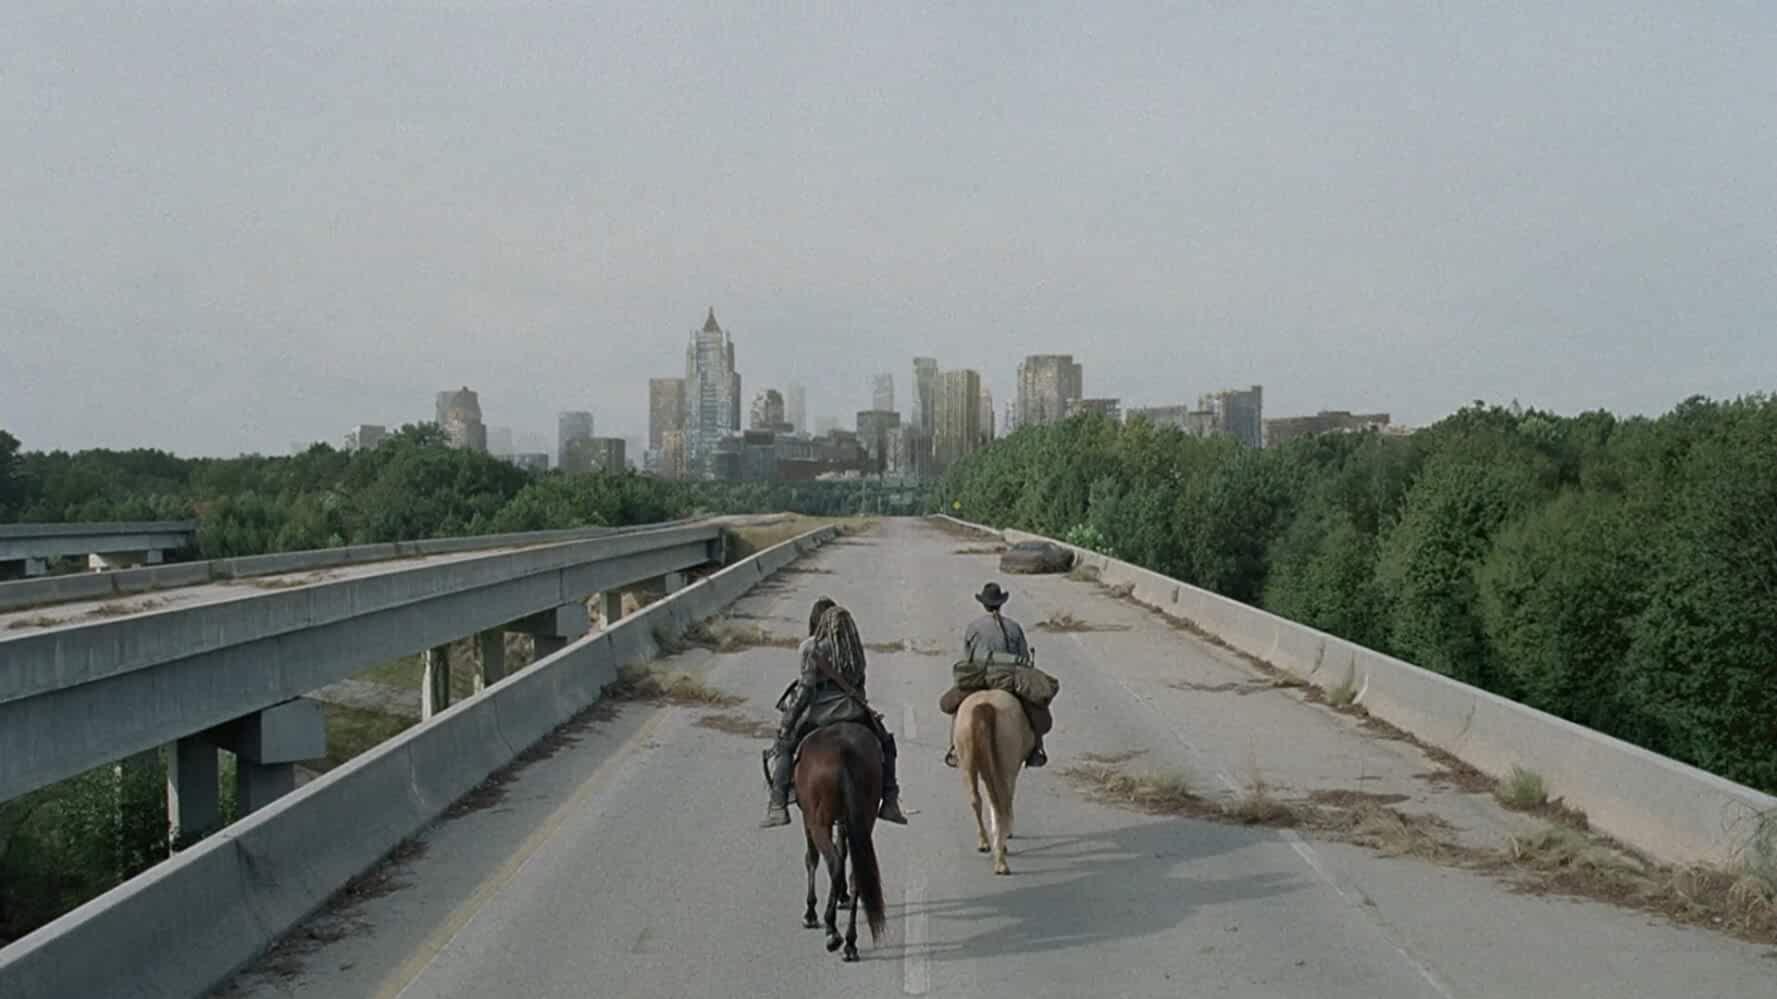 Apocalypse delayed? 'Walking Dead' finale postponed by virus